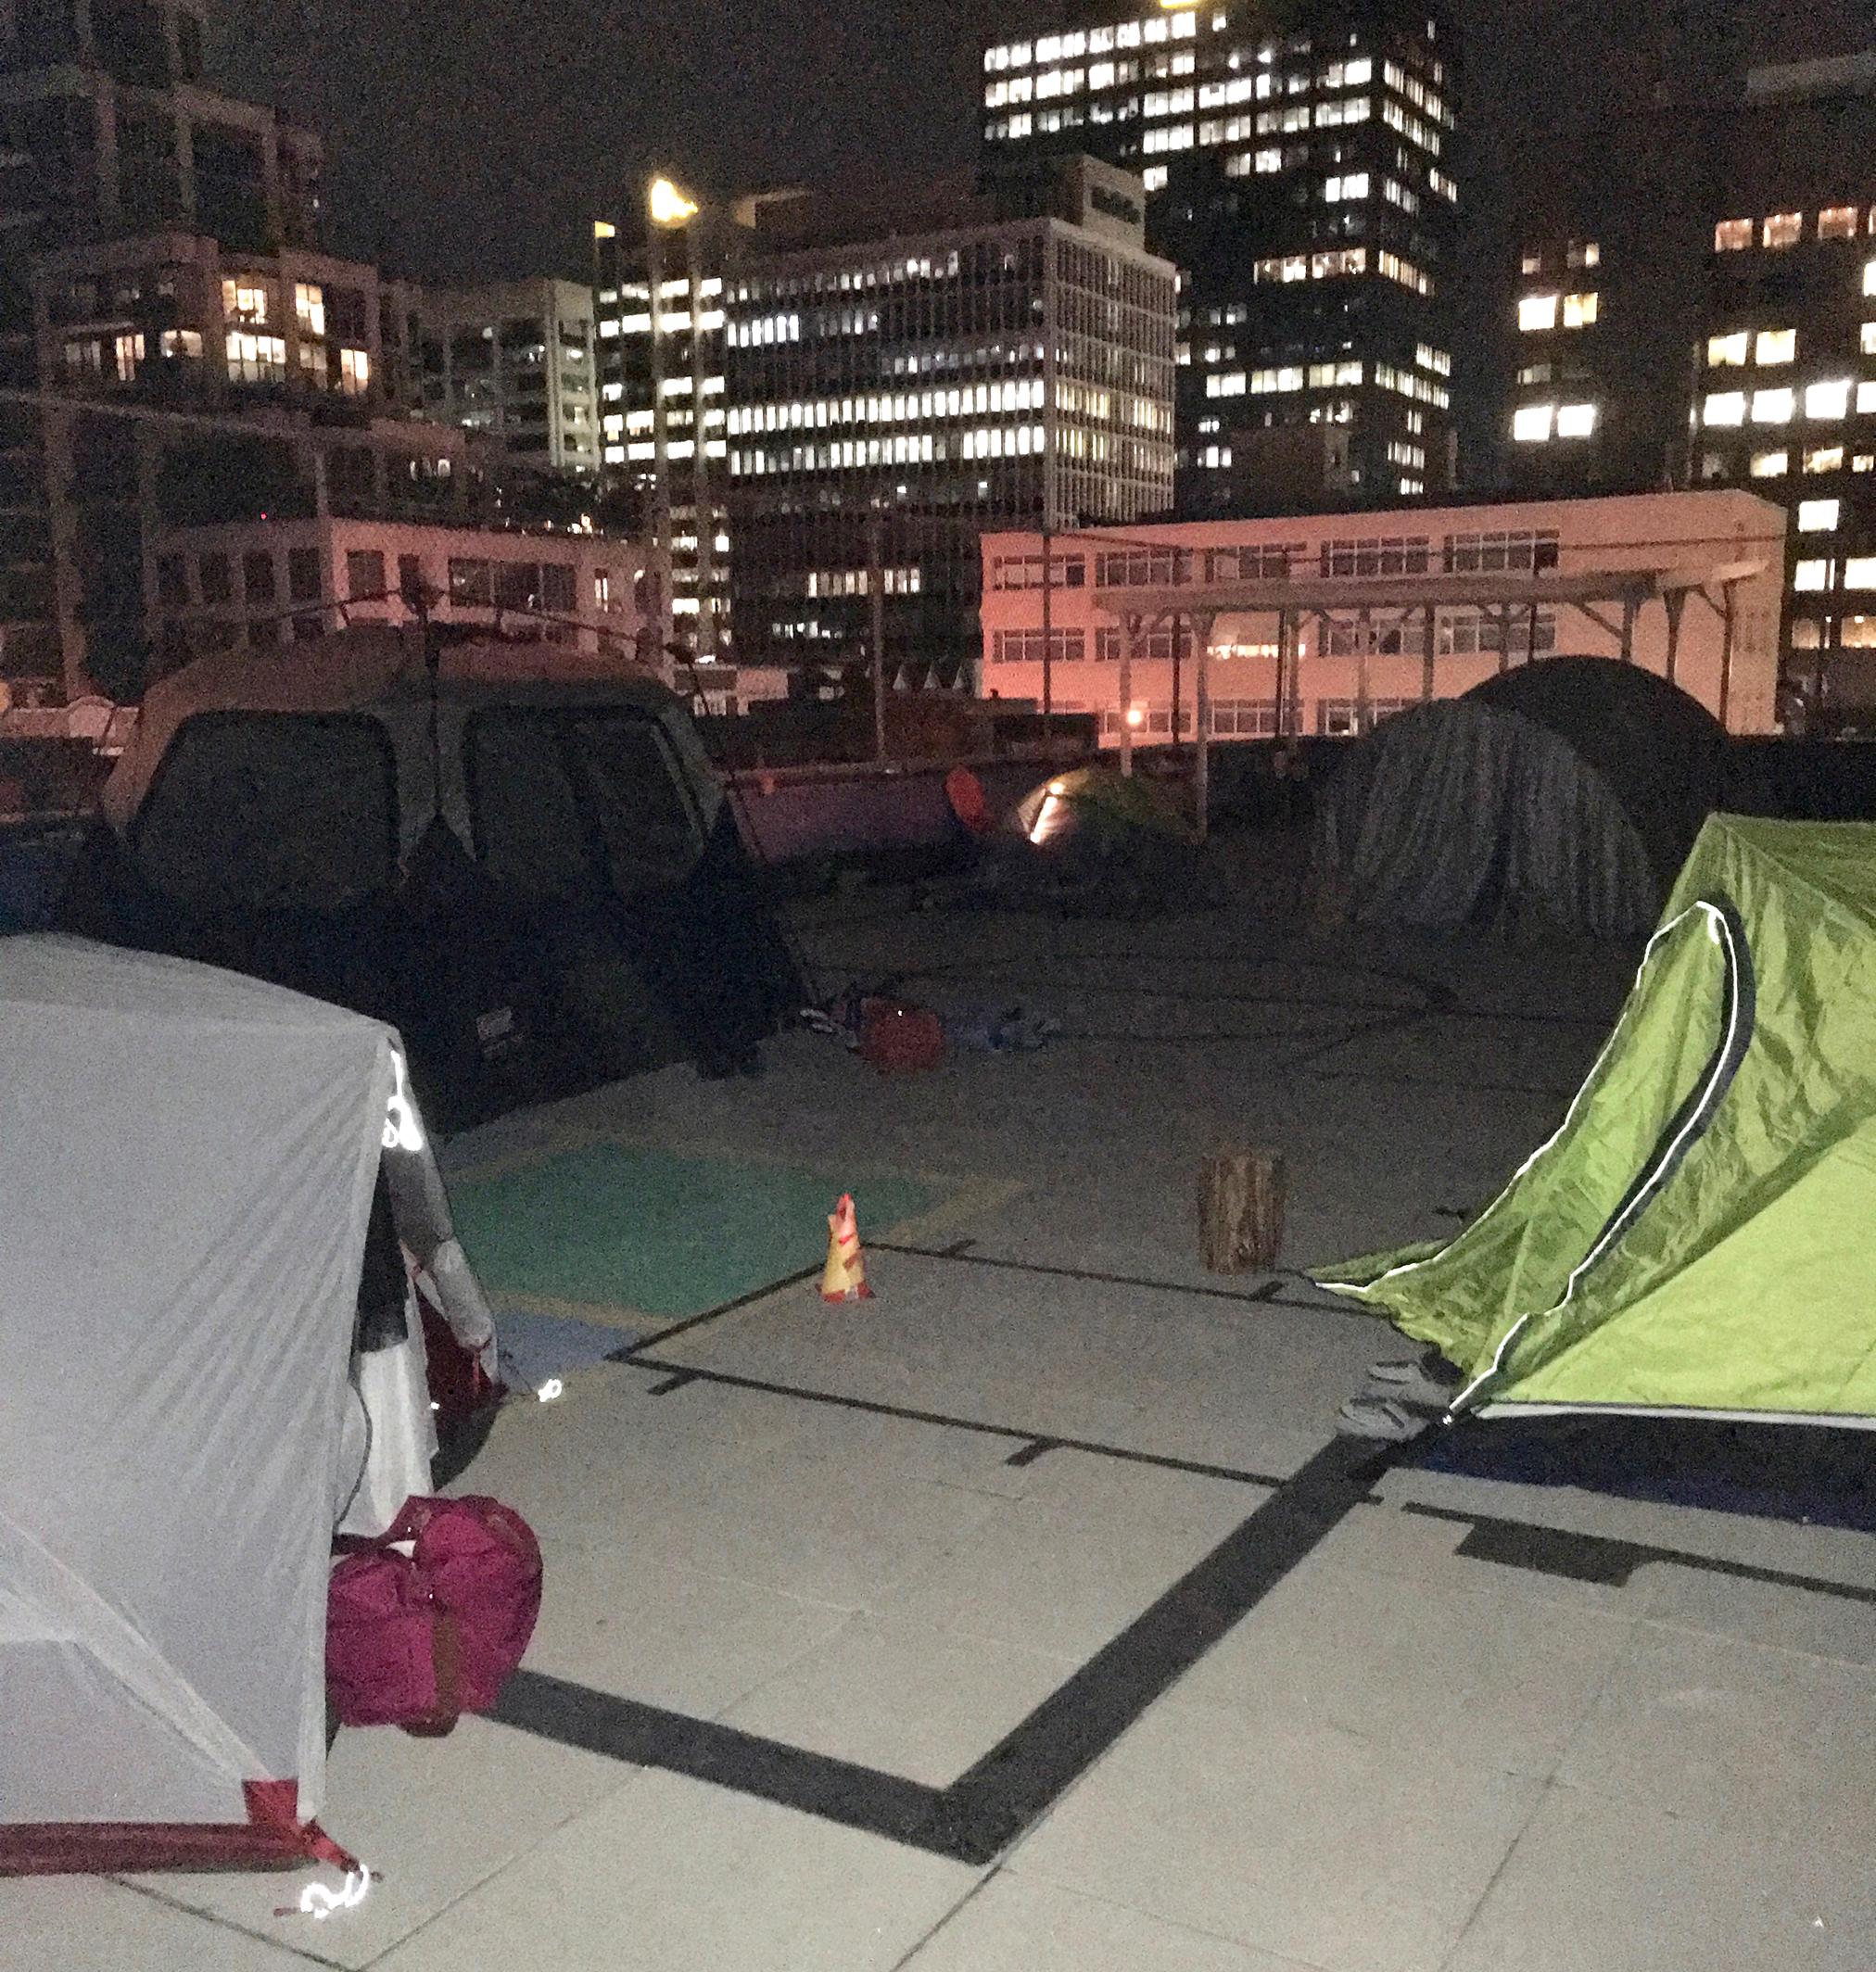 Camping2018_7.jpg